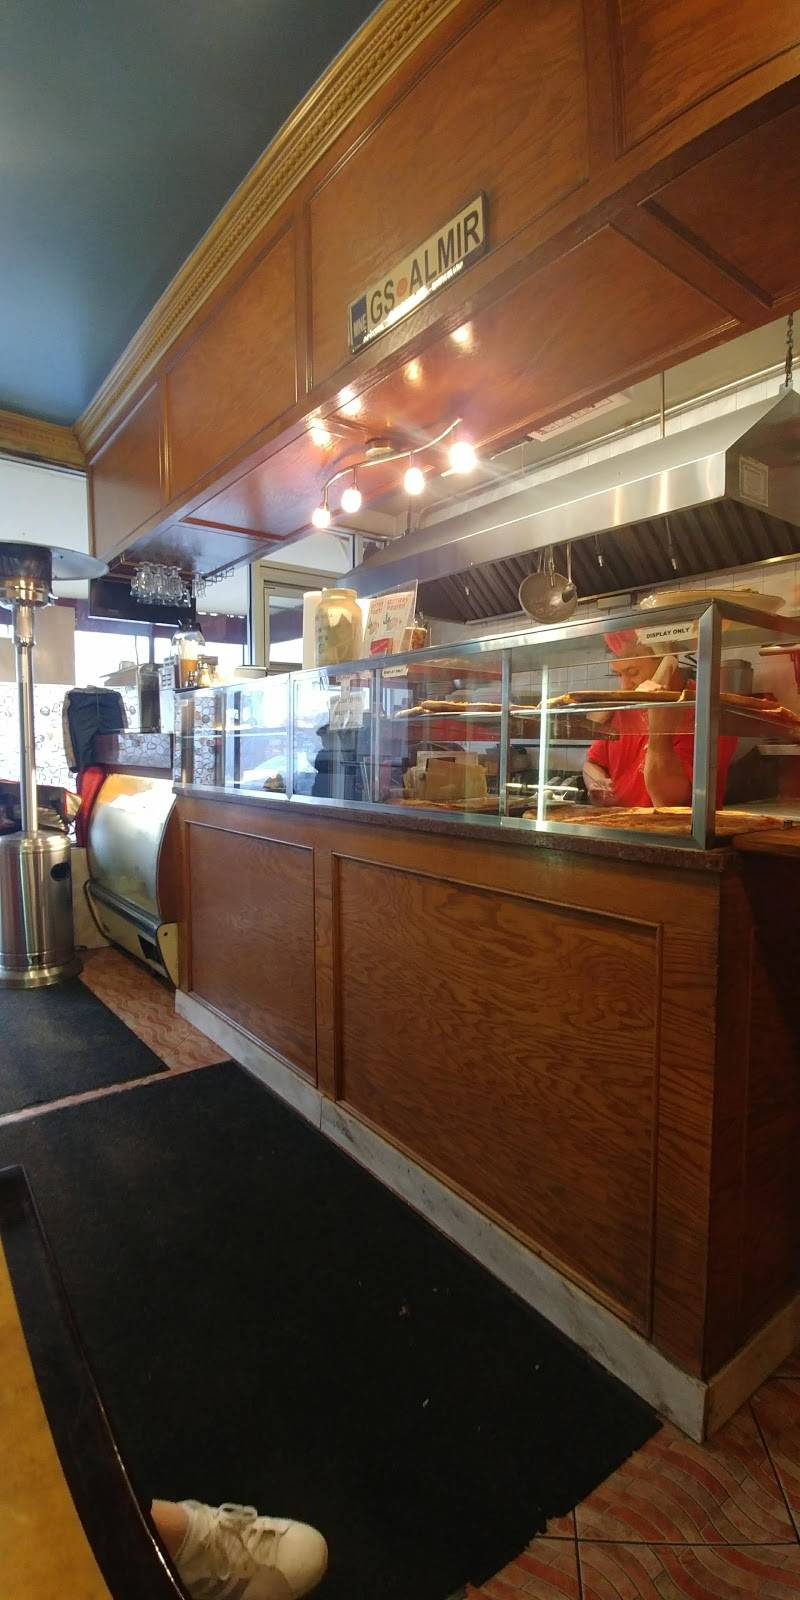 Brothers Pizzeria   restaurant   3050 14th St, Astoria, NY 11102, USA   7187771111 OR +1 718-777-1111